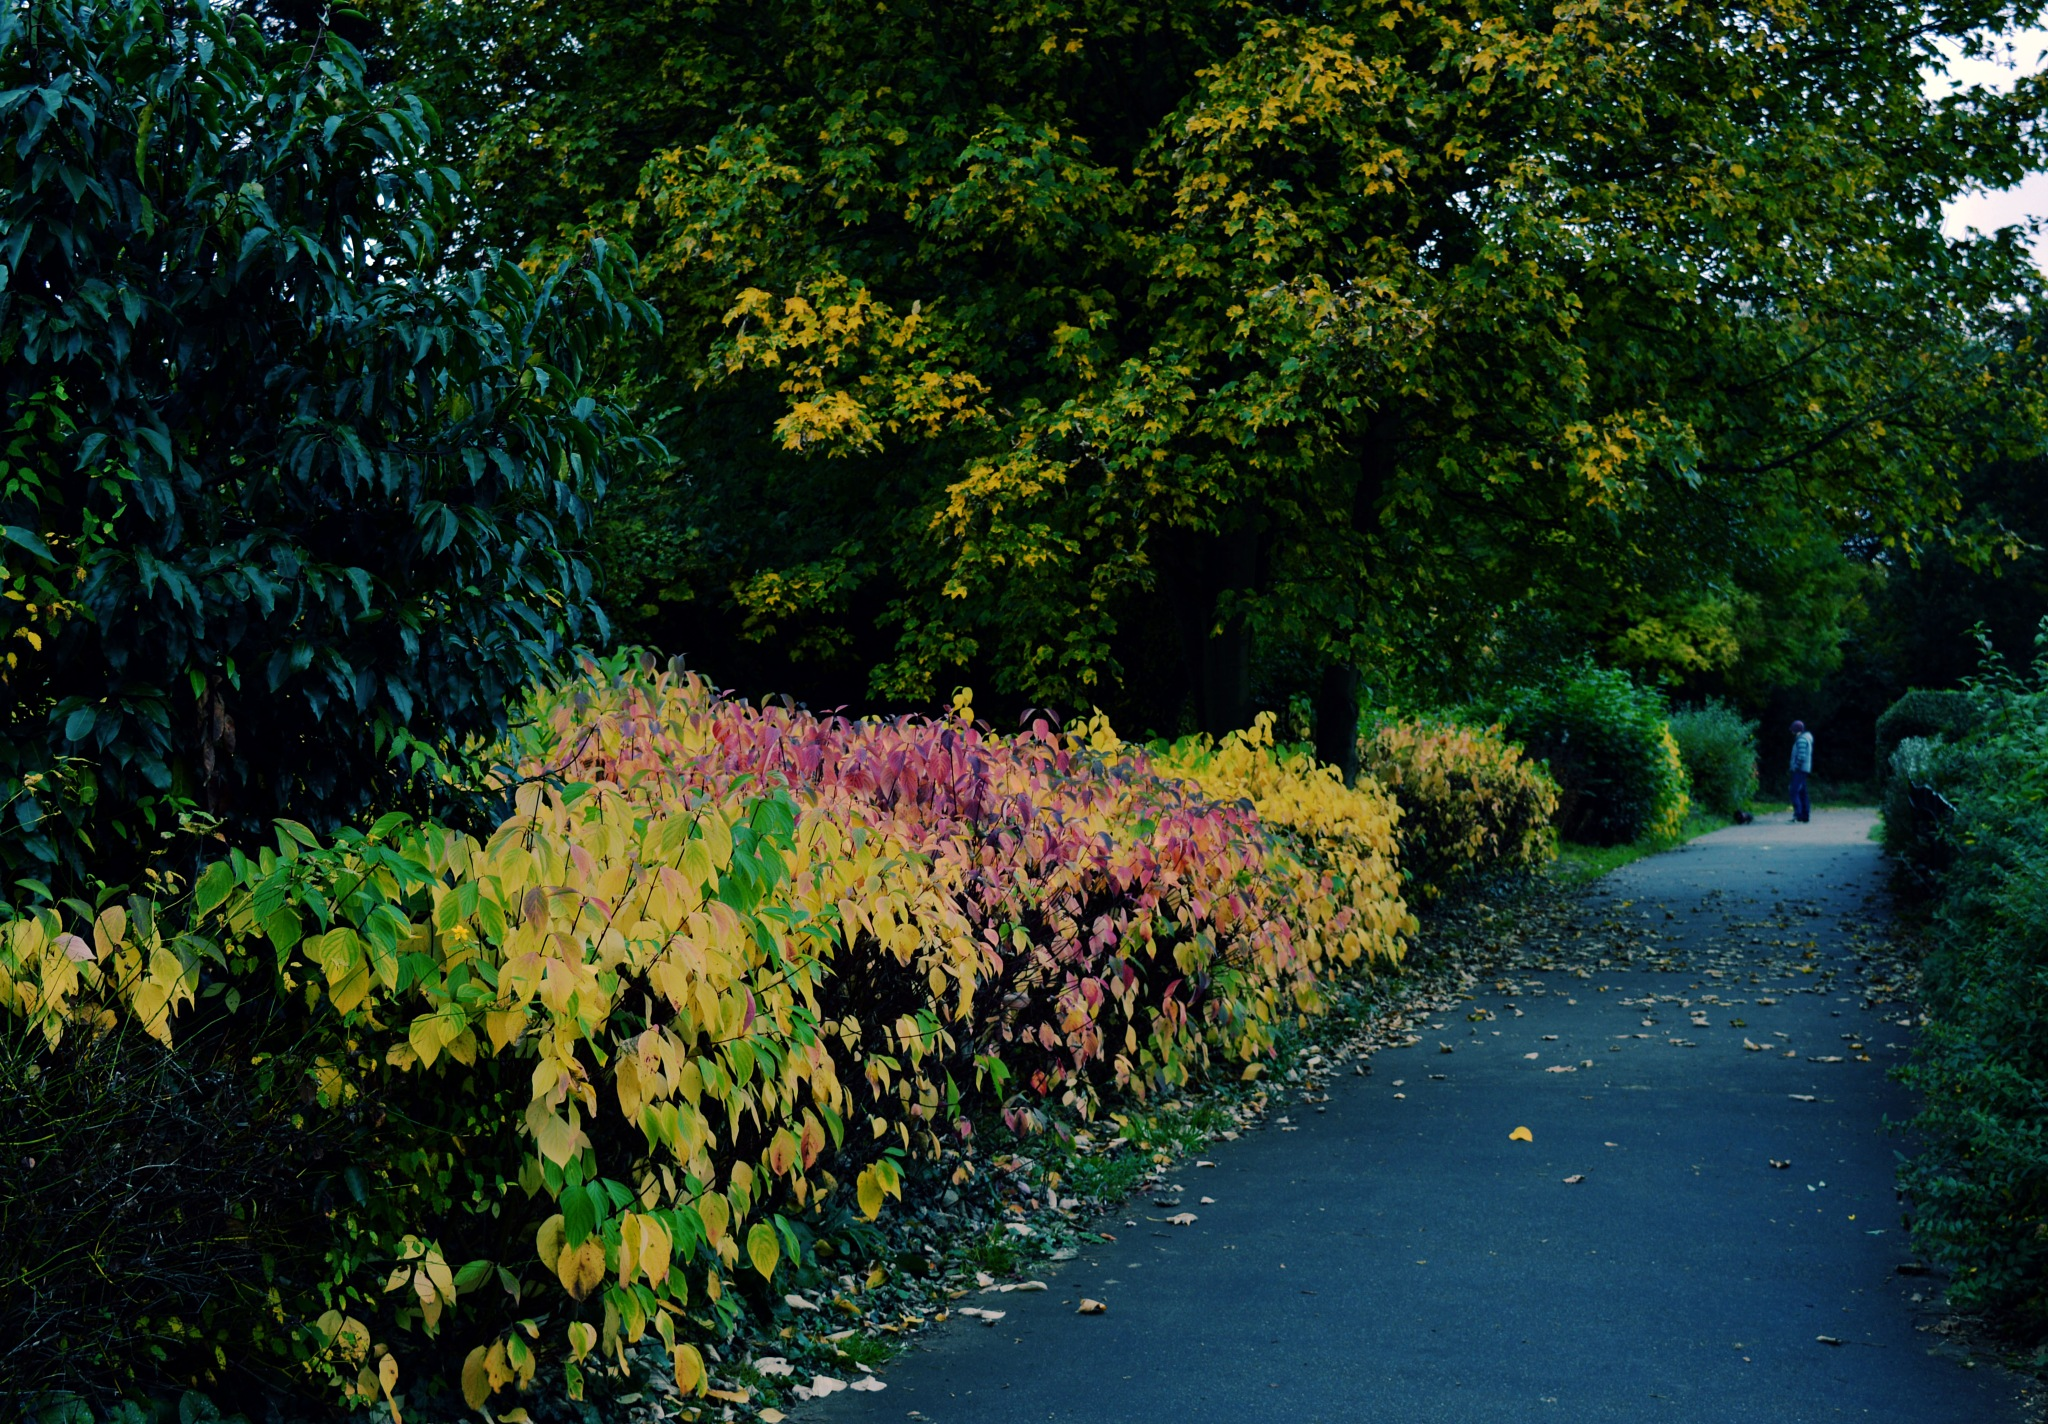 Autumn is Wonderful by Mark Pemberton